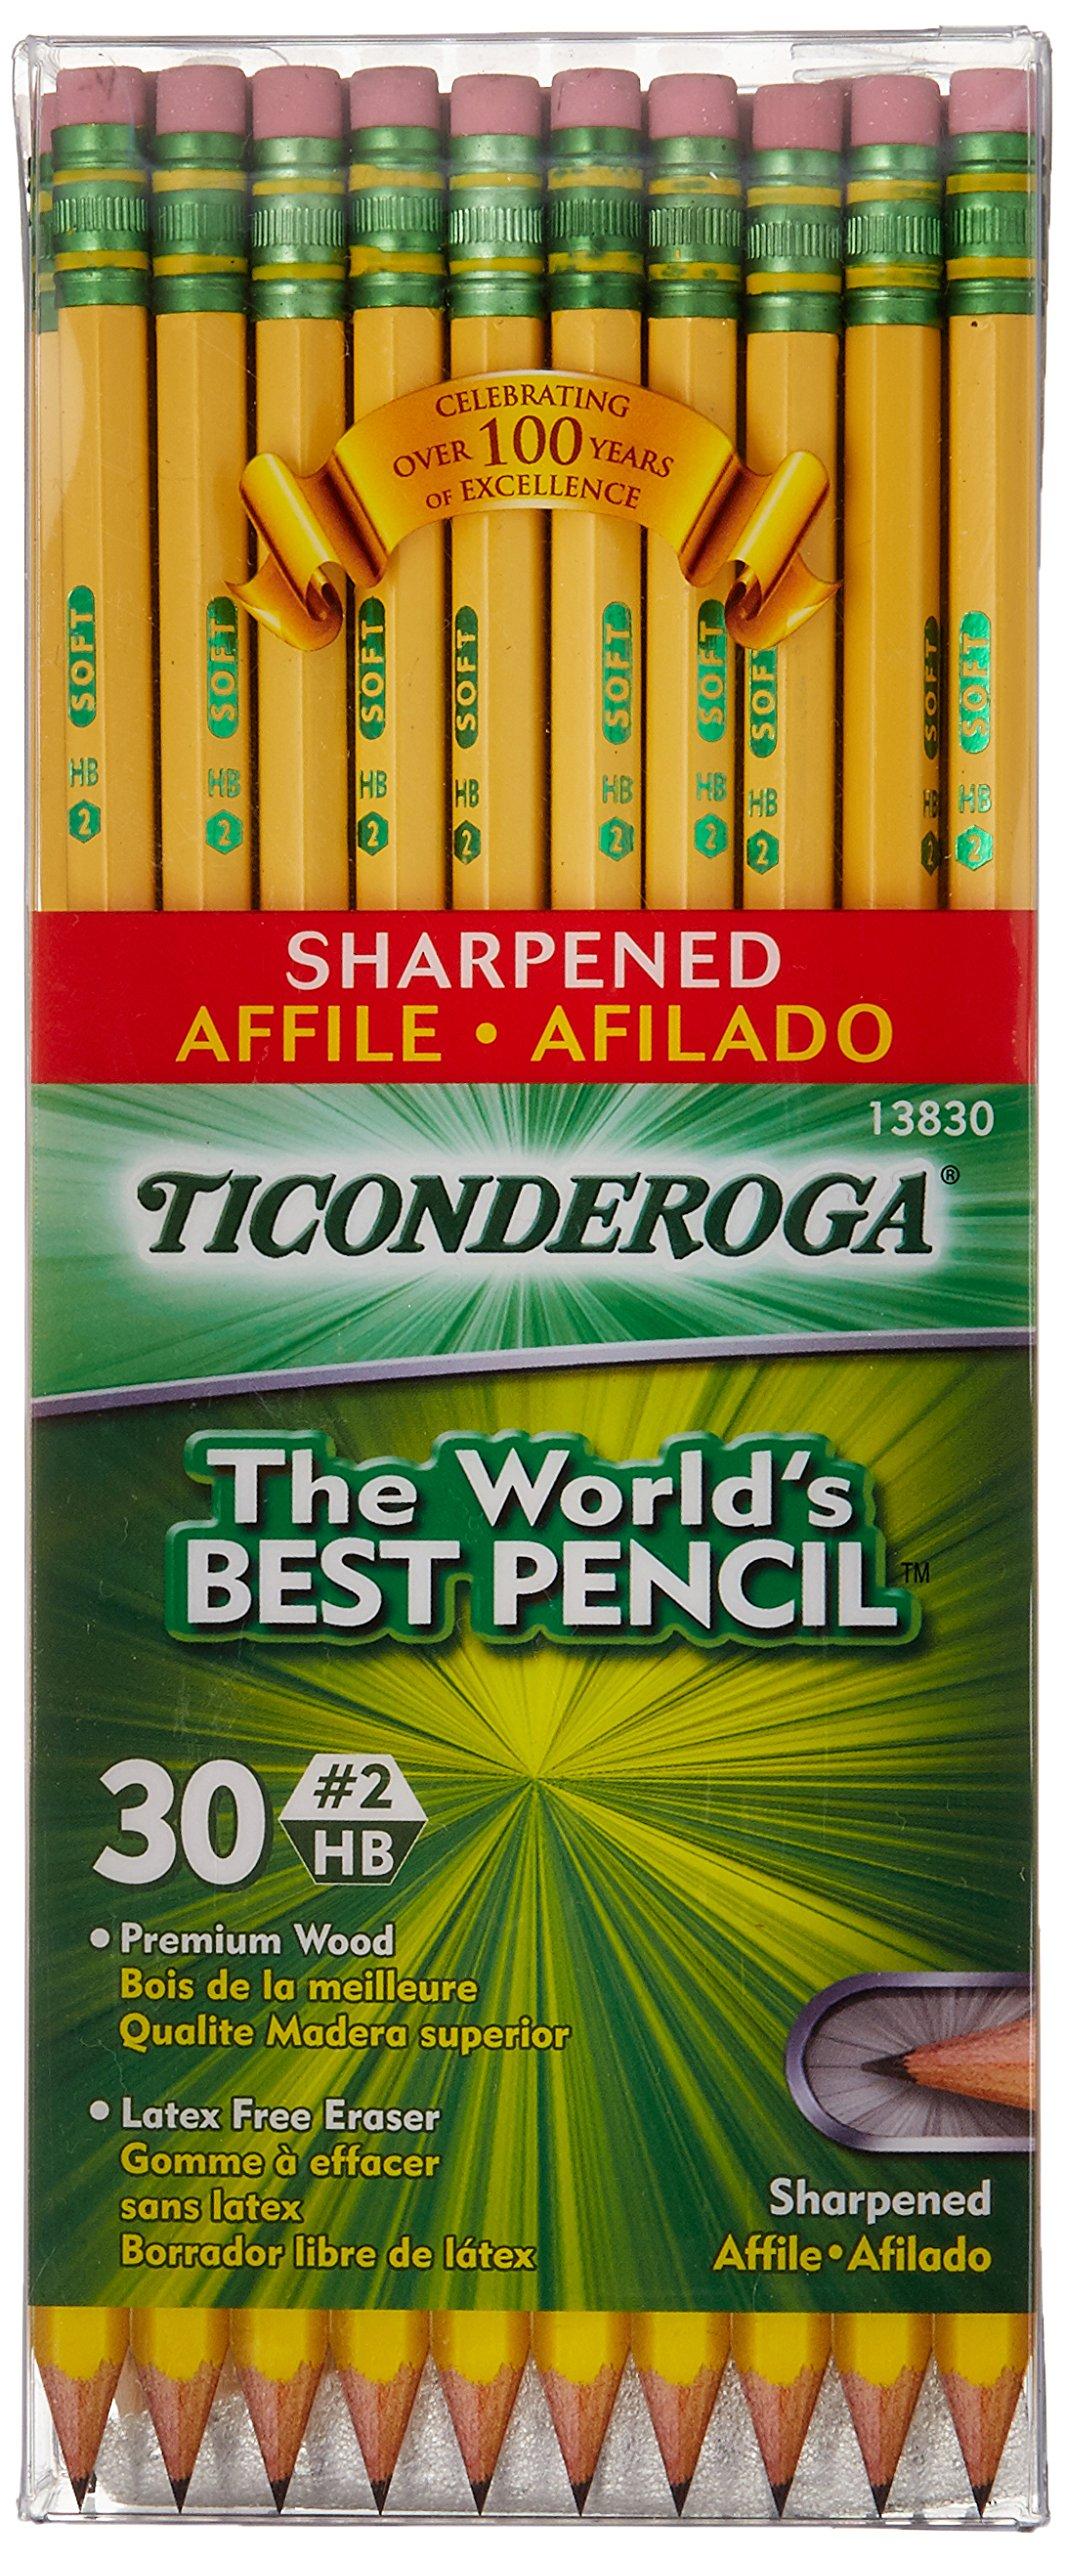 Dixon Ticonderoga Presharpened No. 2 Pencils-Pencils,w/Latex Free Eraser,Presharpened,No 2,30/BX, YW (Wholesale Case of 20) by DIX (Image #1)